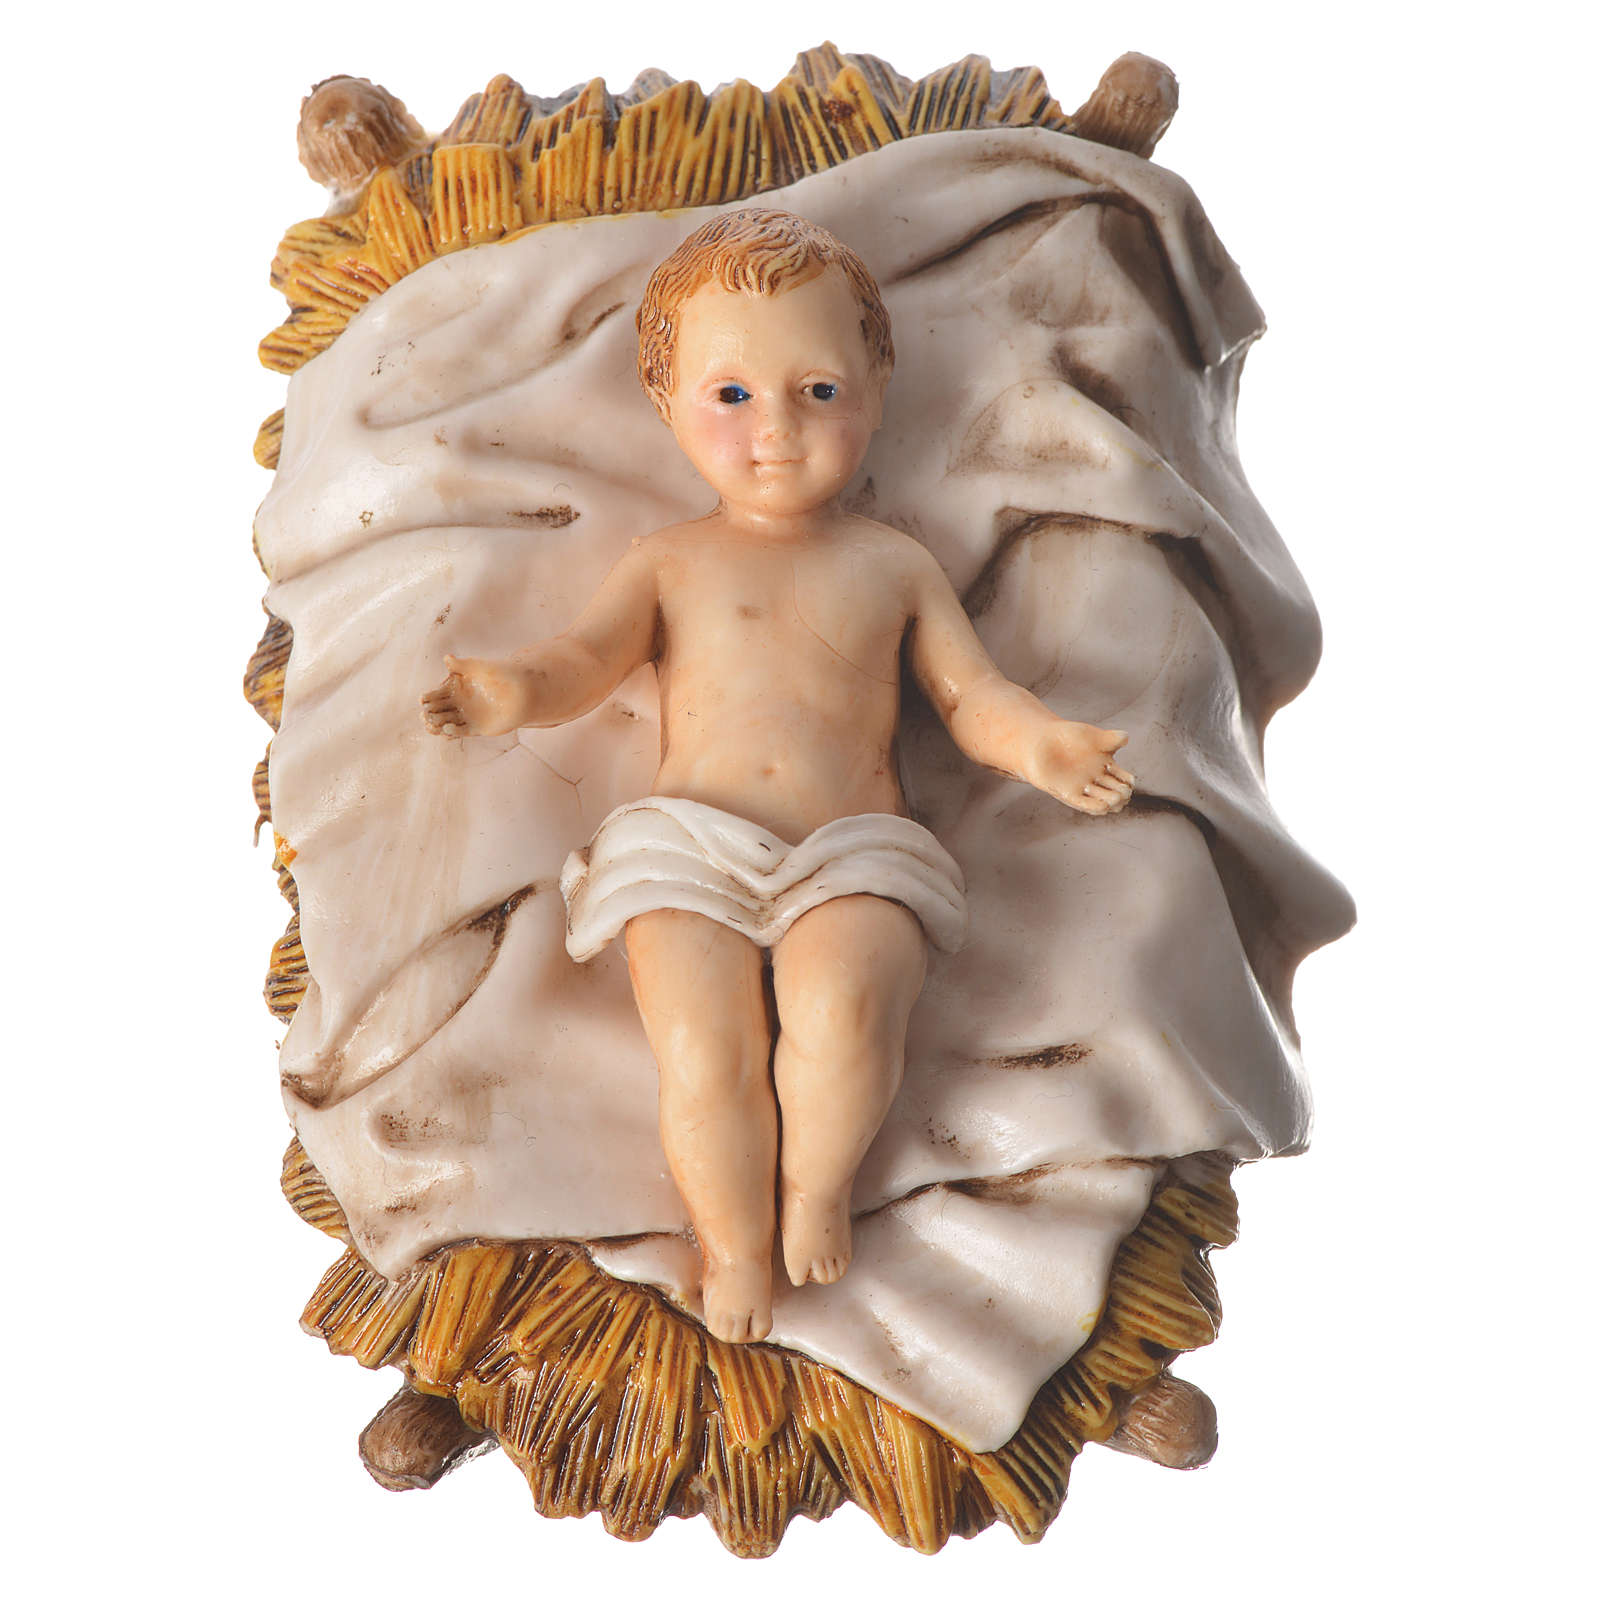 Natività 13 cm Moranduzzo 6 pz 4